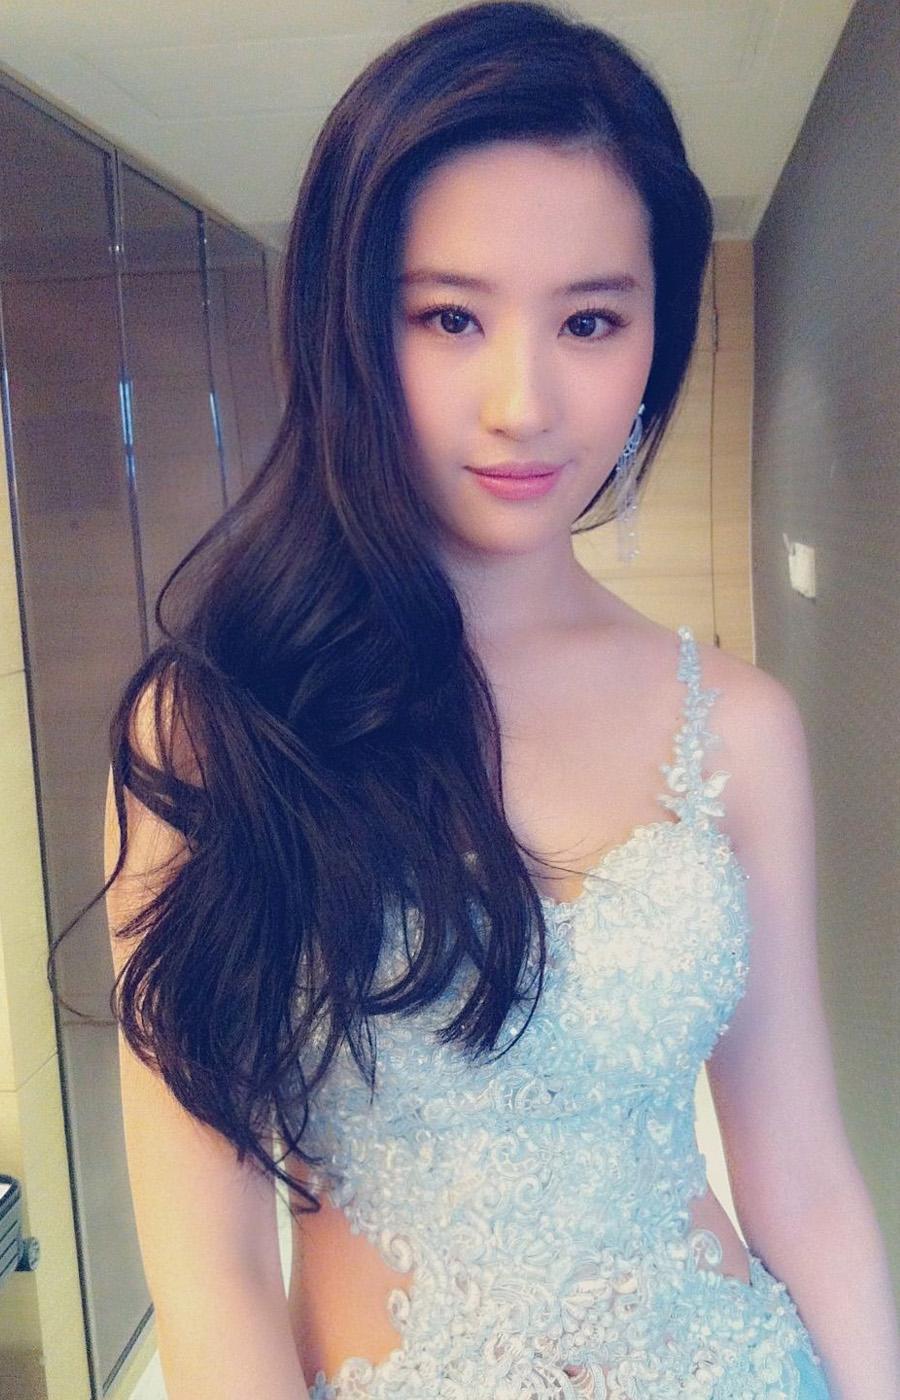 actress HD wallpapers 1080p free download at HDwalle.com, Liu Yifei HD ...